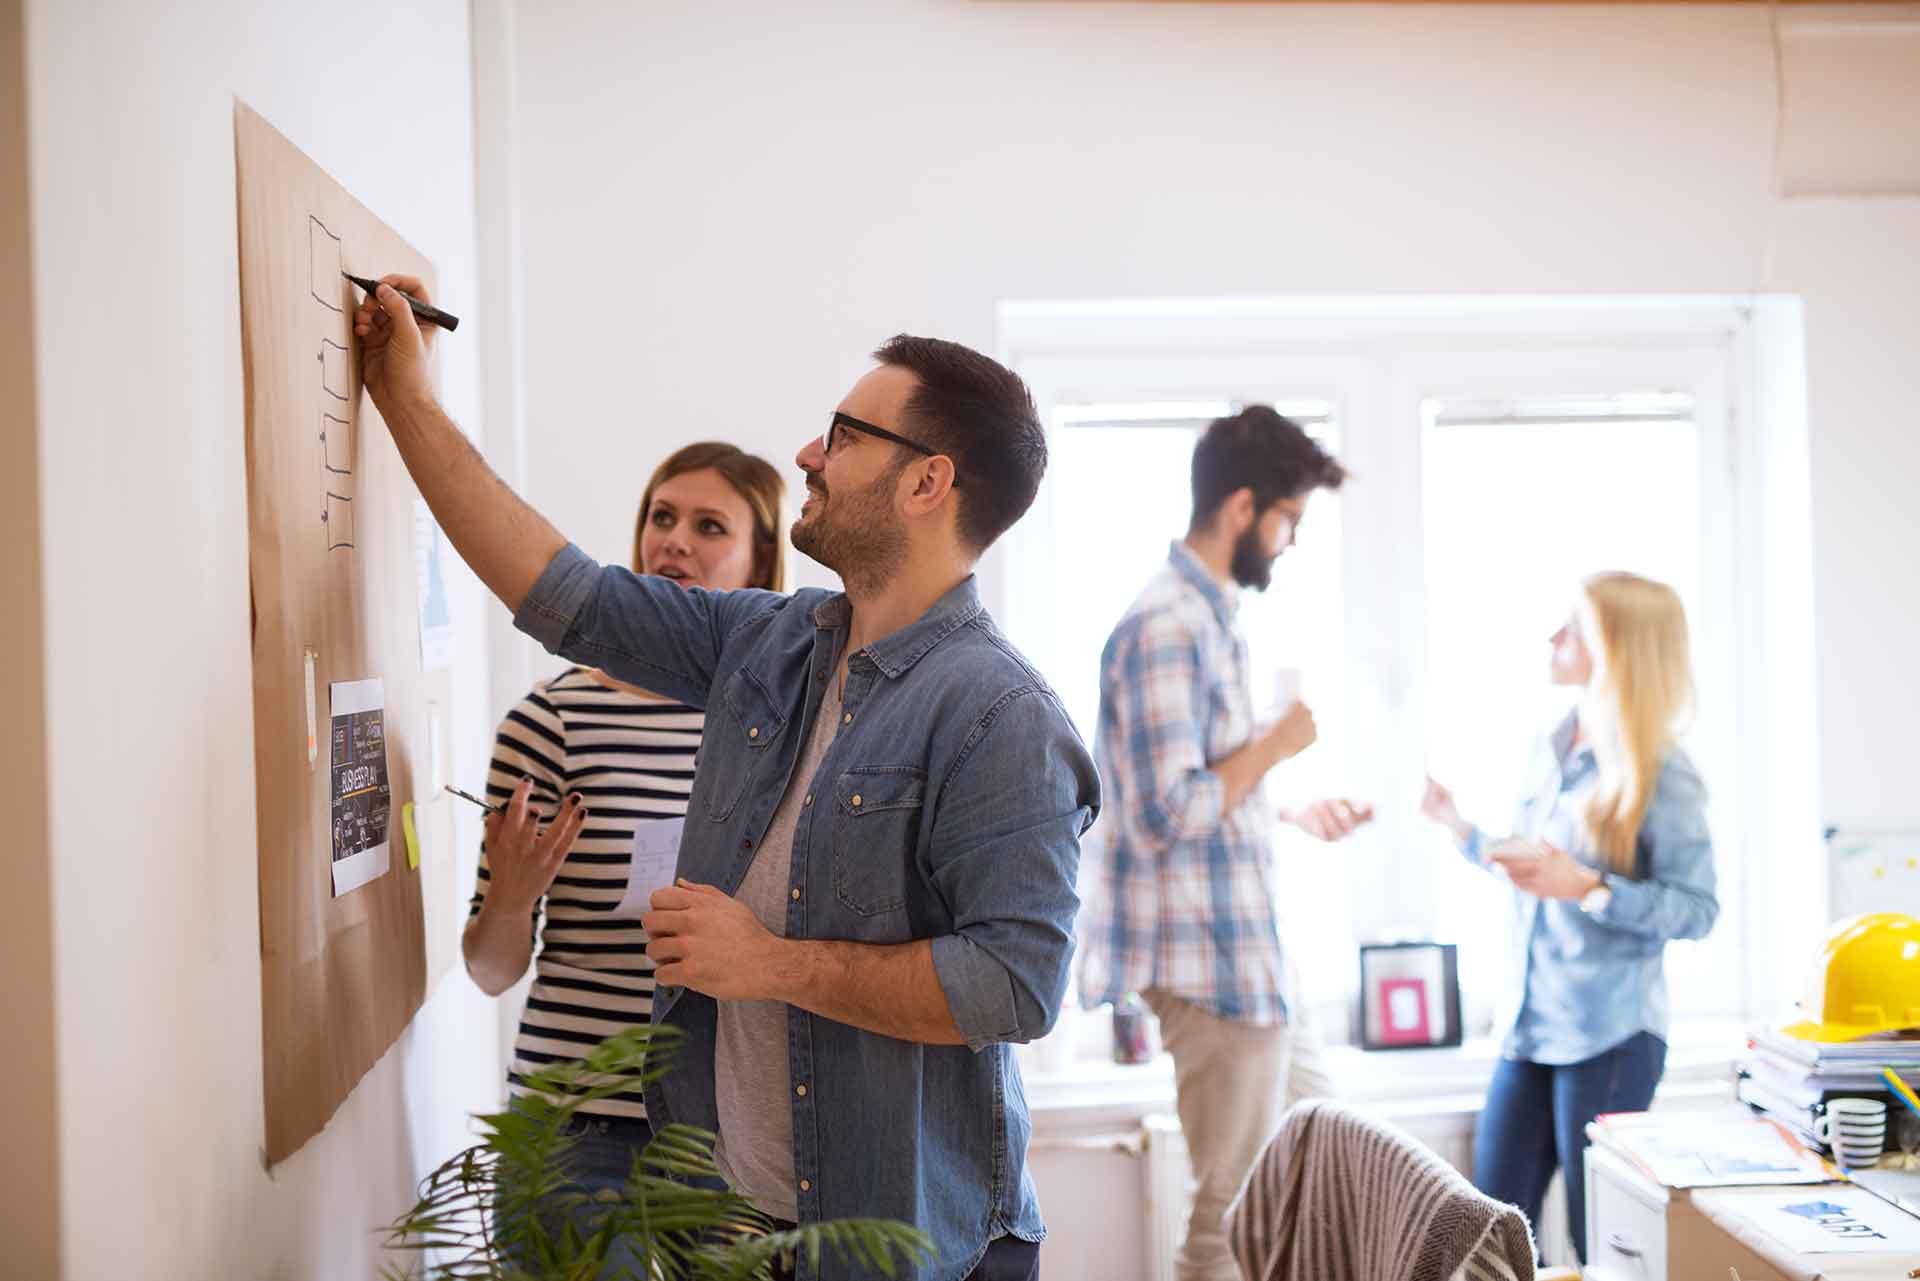 marketing team membahas cara mengoptimalkan micro moment marketing digital mereka